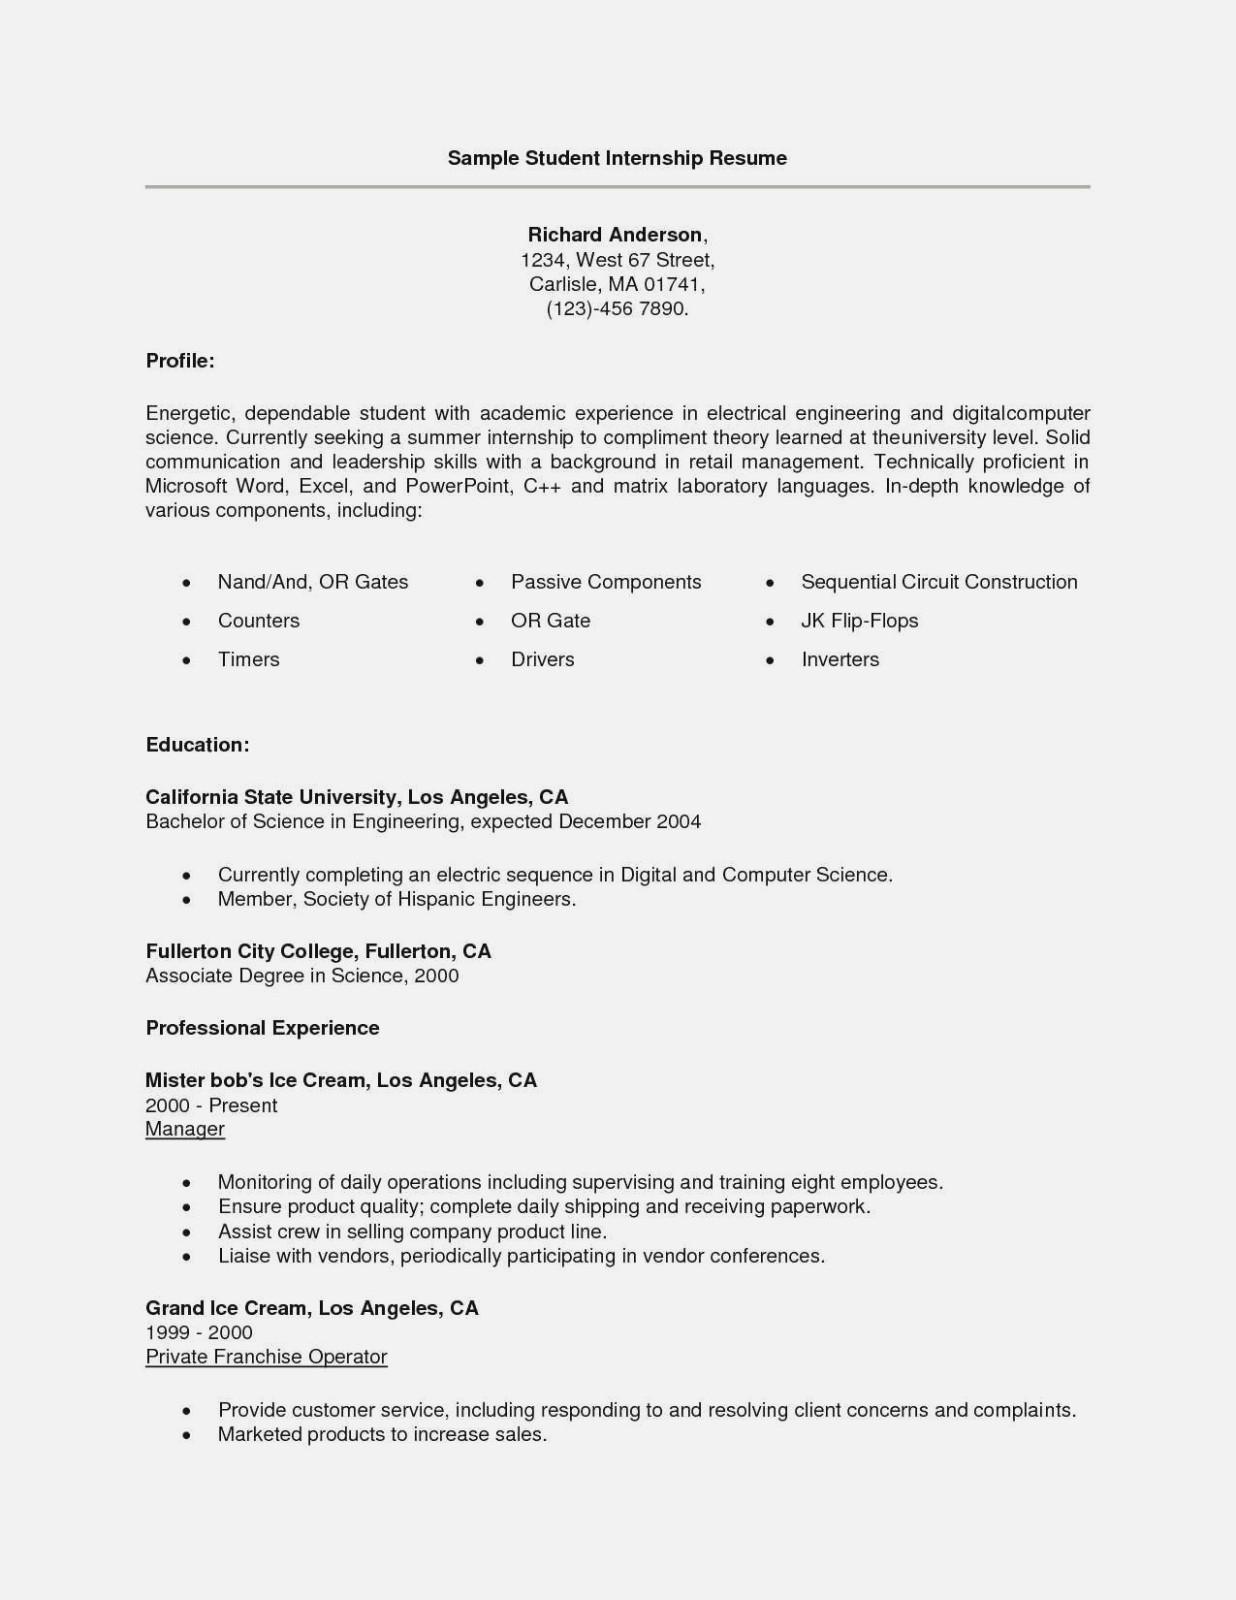 Engineering Internship Resume Template Word